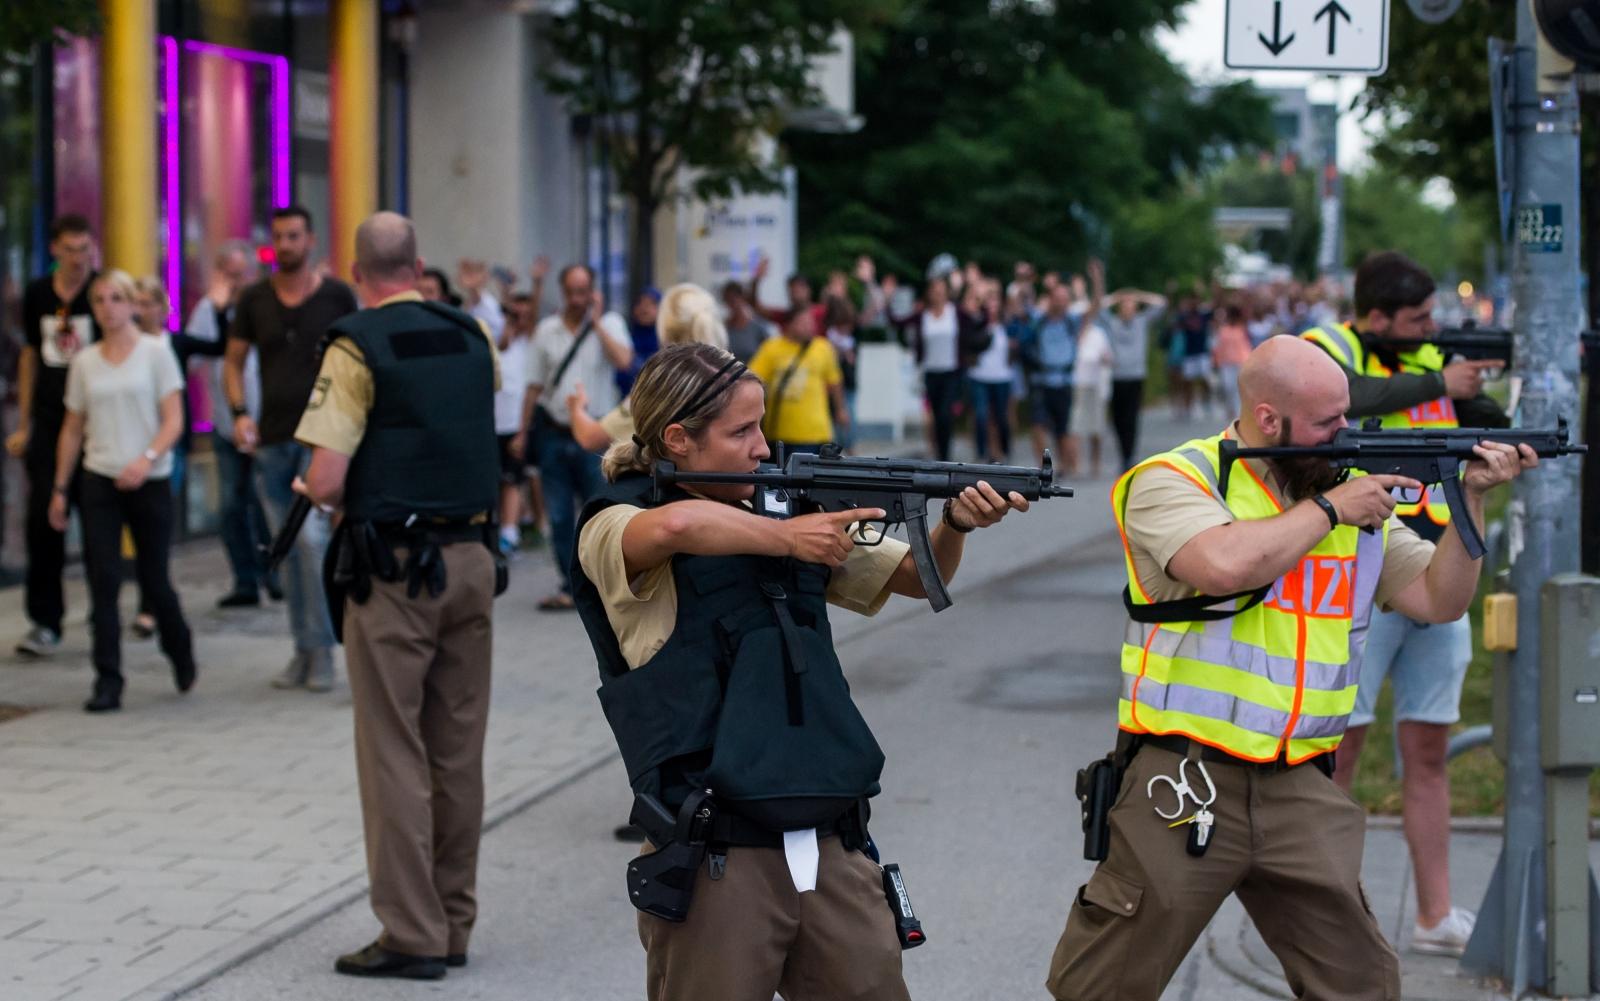 munich shooting people fleeing scene